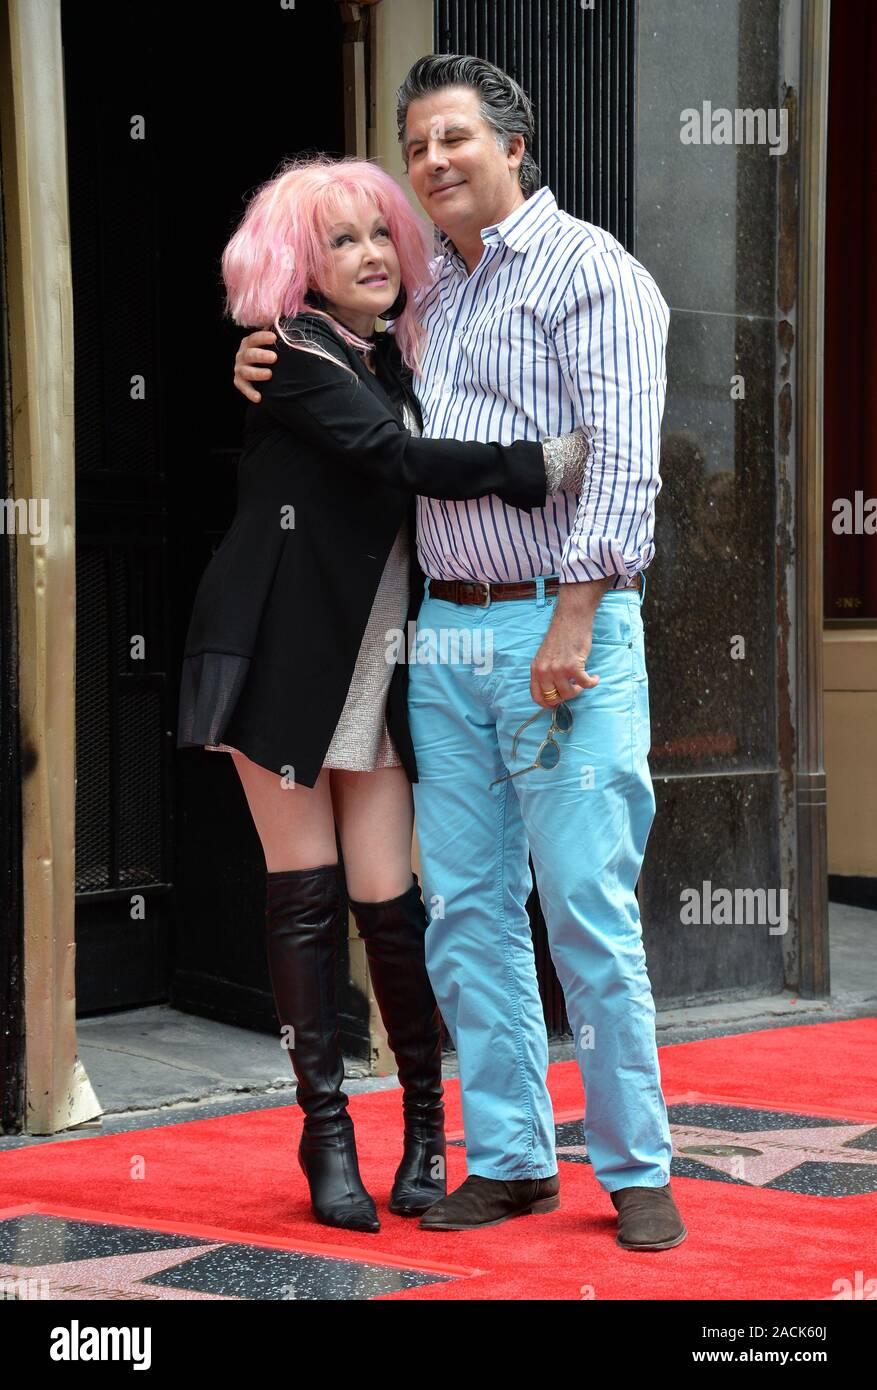 Cyndi Lauper Husband High Resolution Stock Photography and Images - Alamy